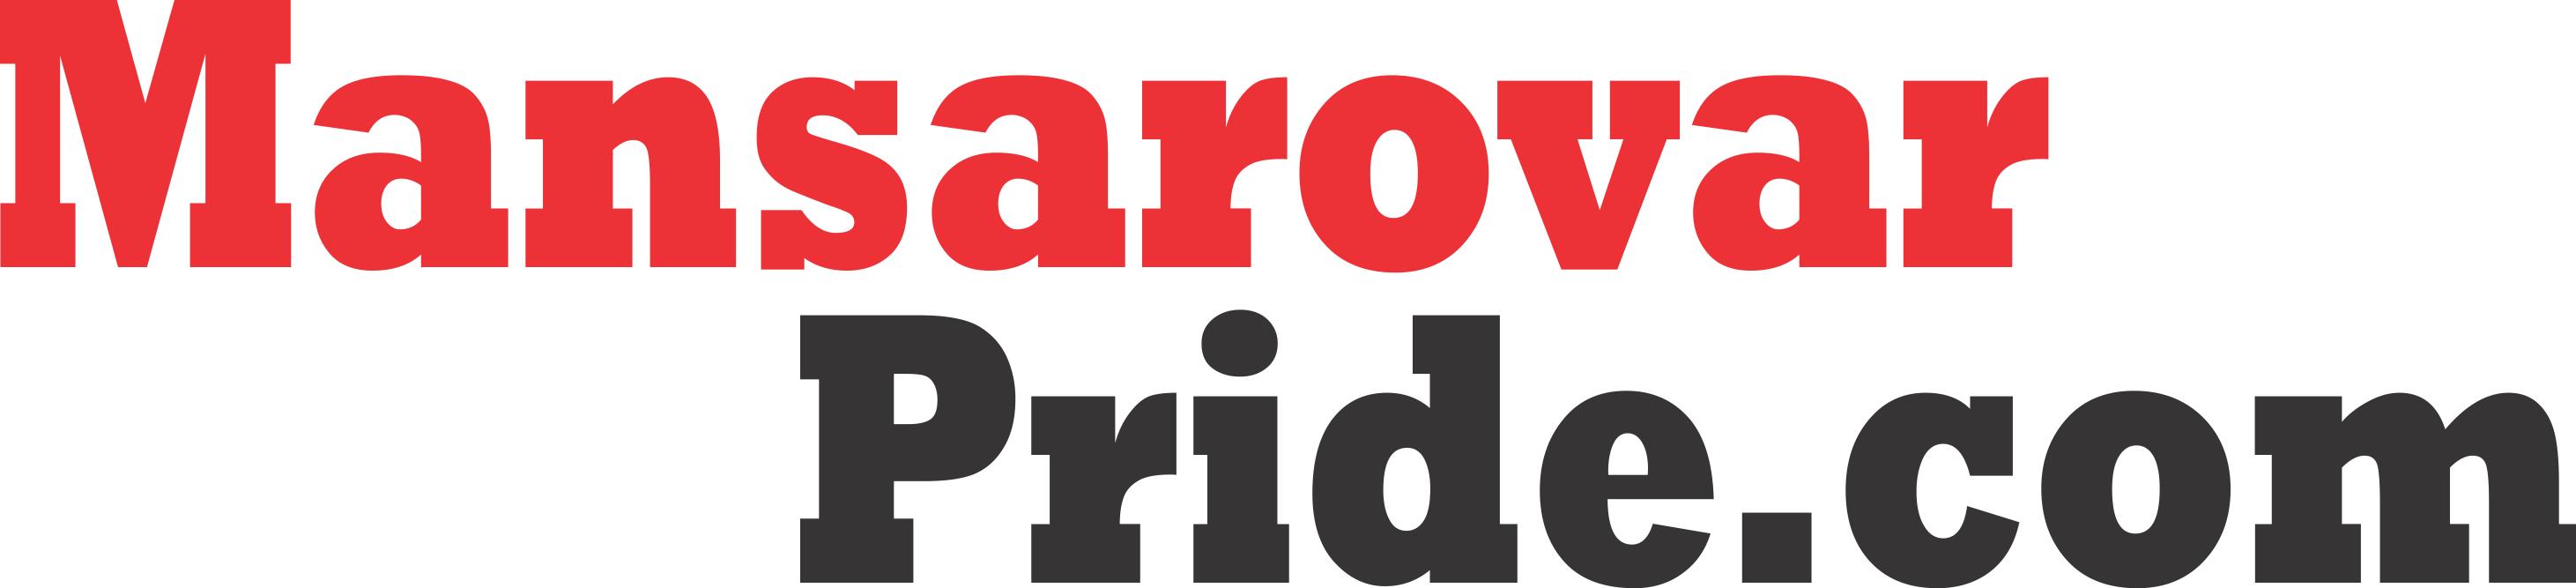 Mansarovar Pride